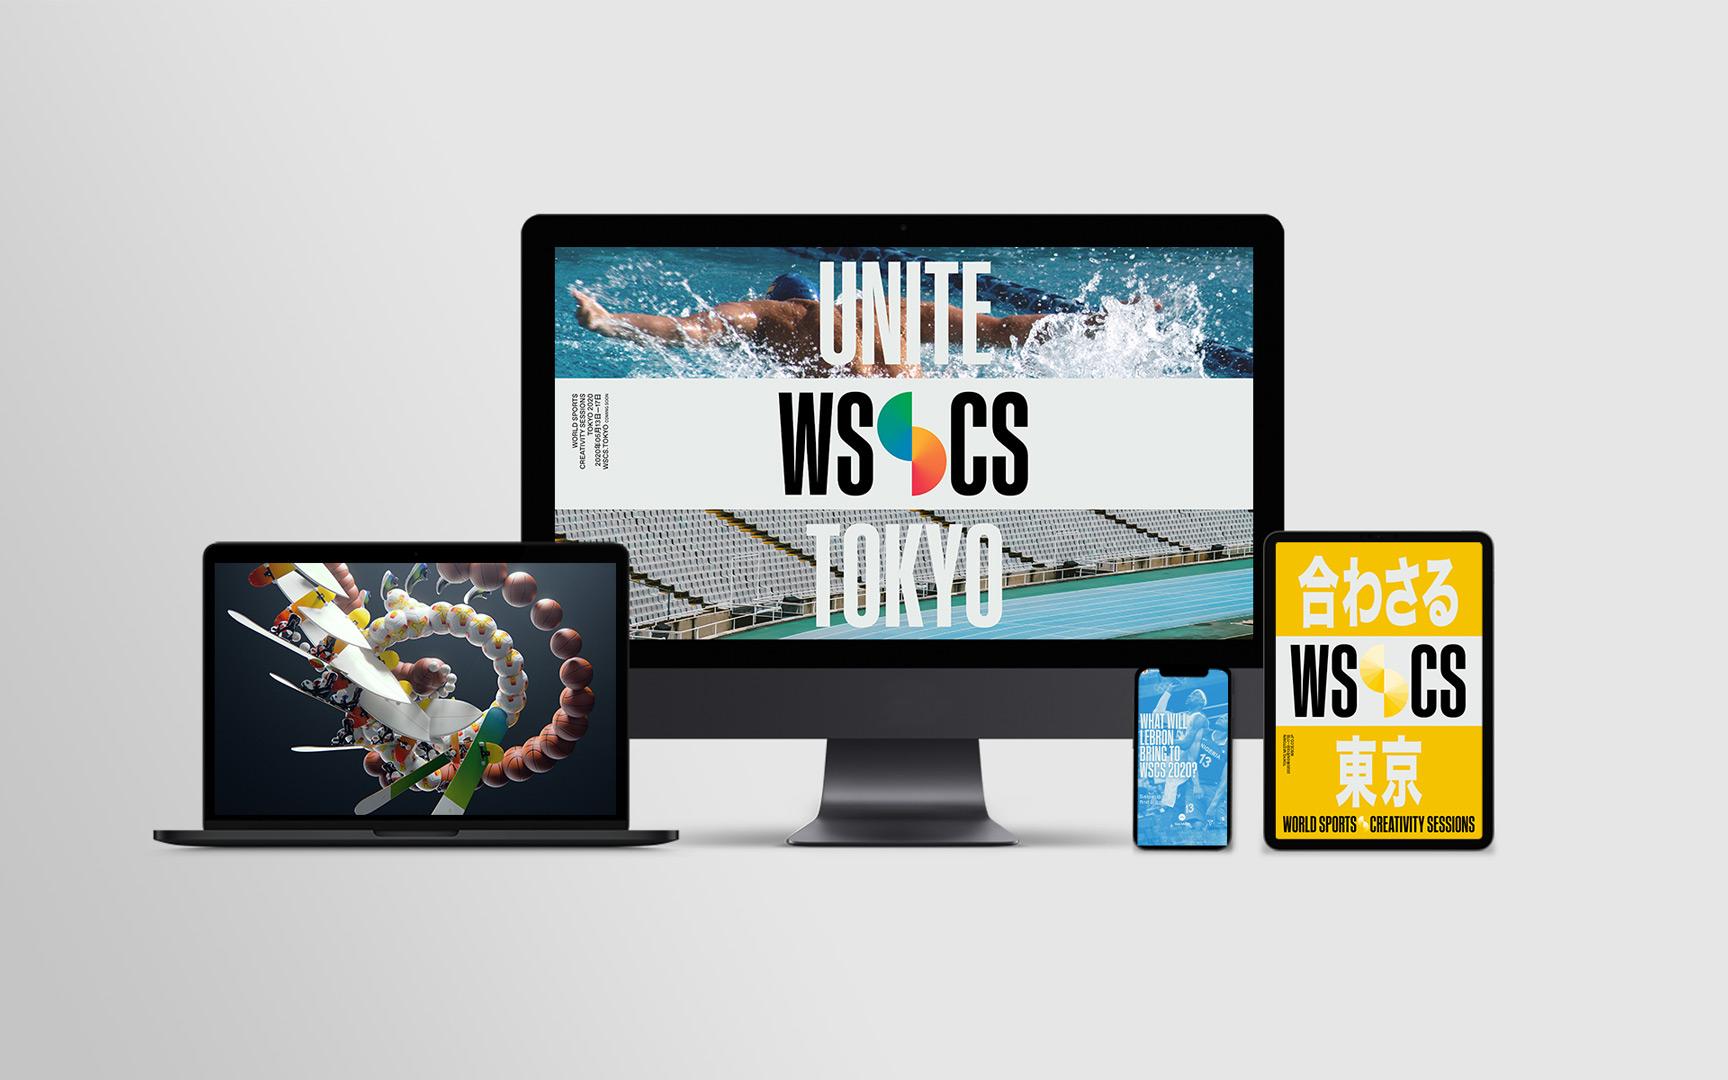 World Sports Creativity Sessions